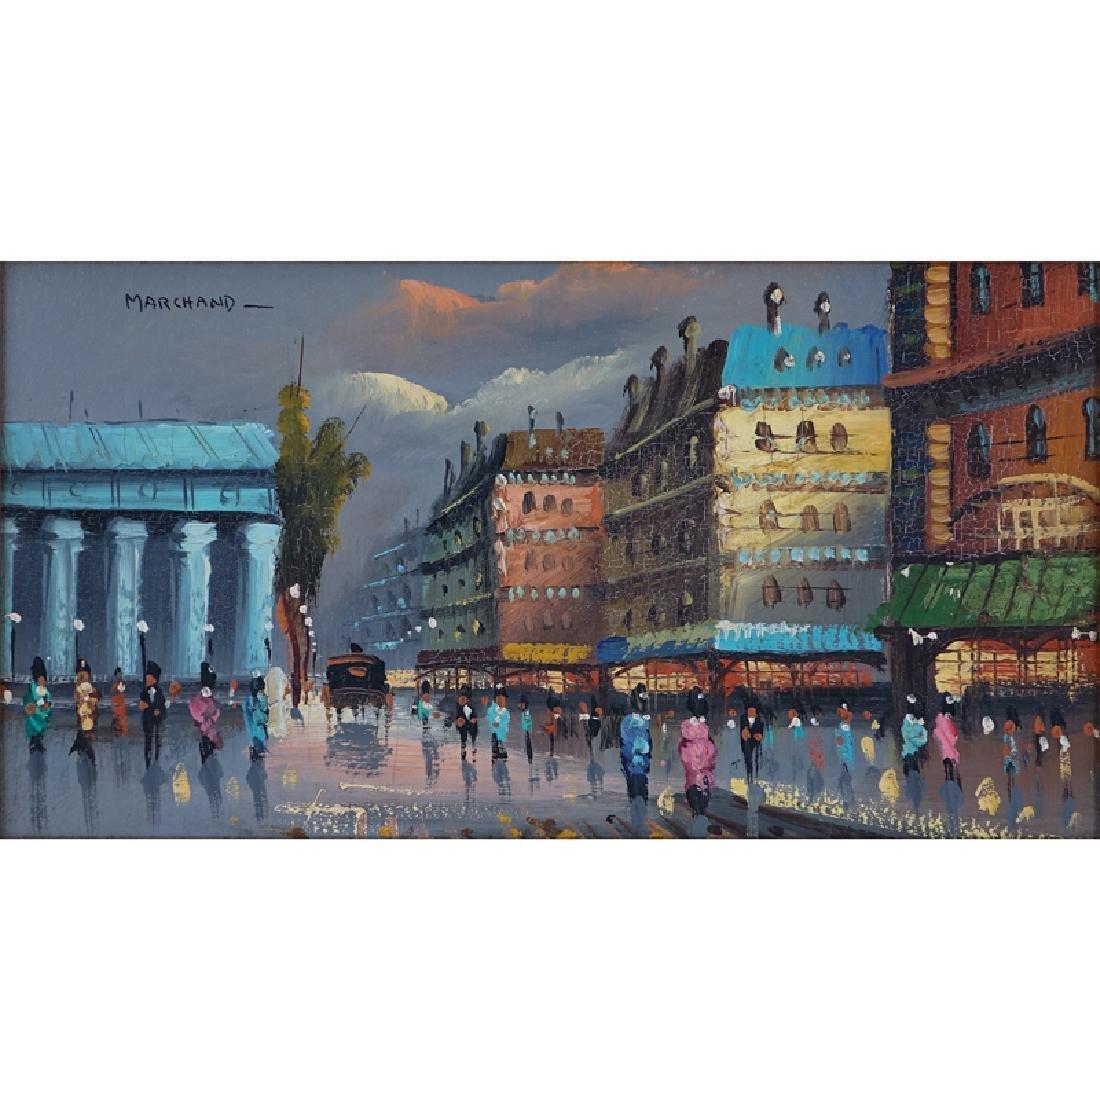 Marchand (20th C.) Oil on Board, Paris Street Scene,